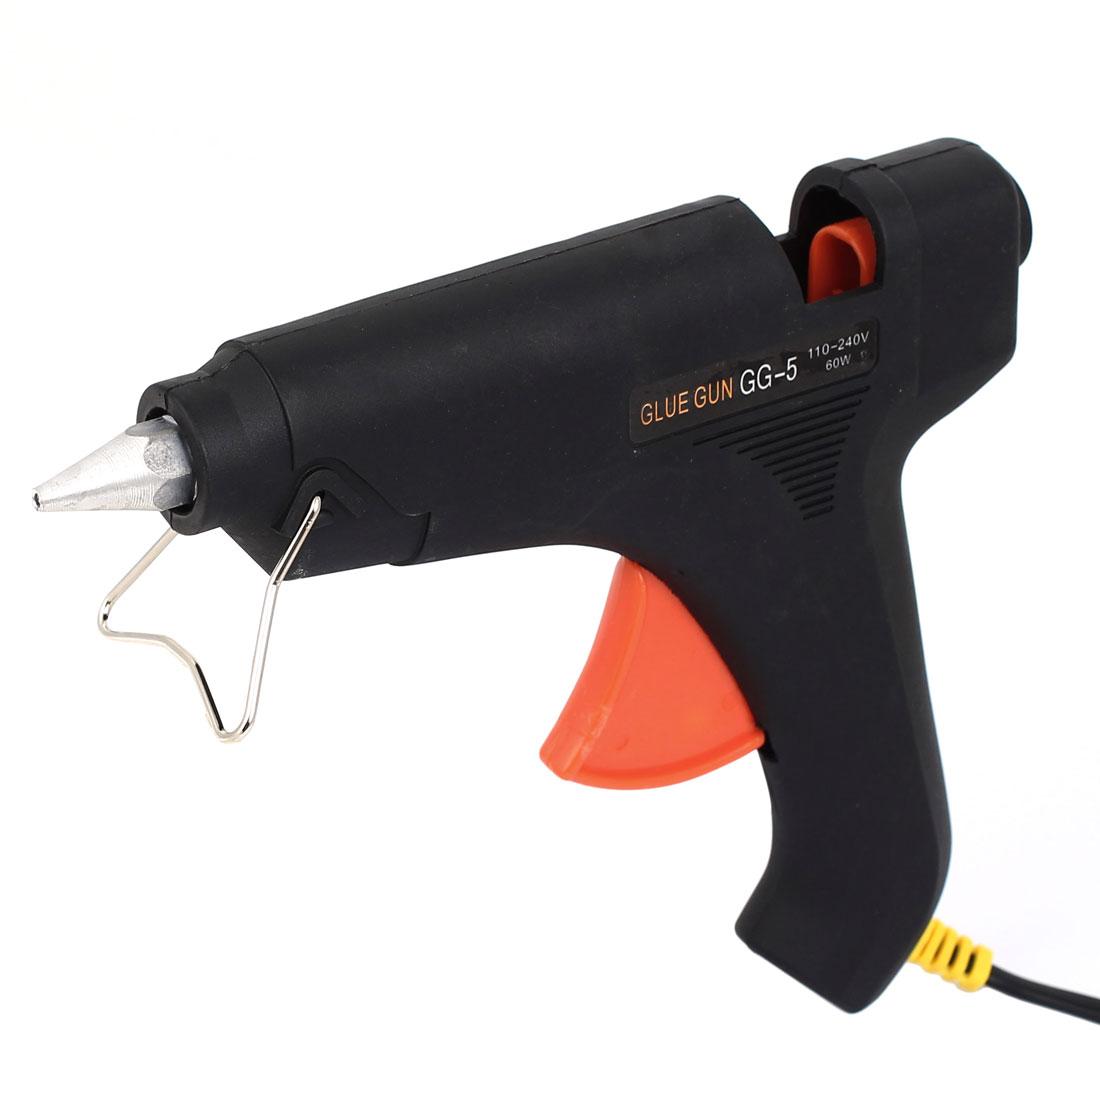 GG-5 Electric Heating Hot Melt Sticks Trigger Glue Gun AC 100~240V 60W